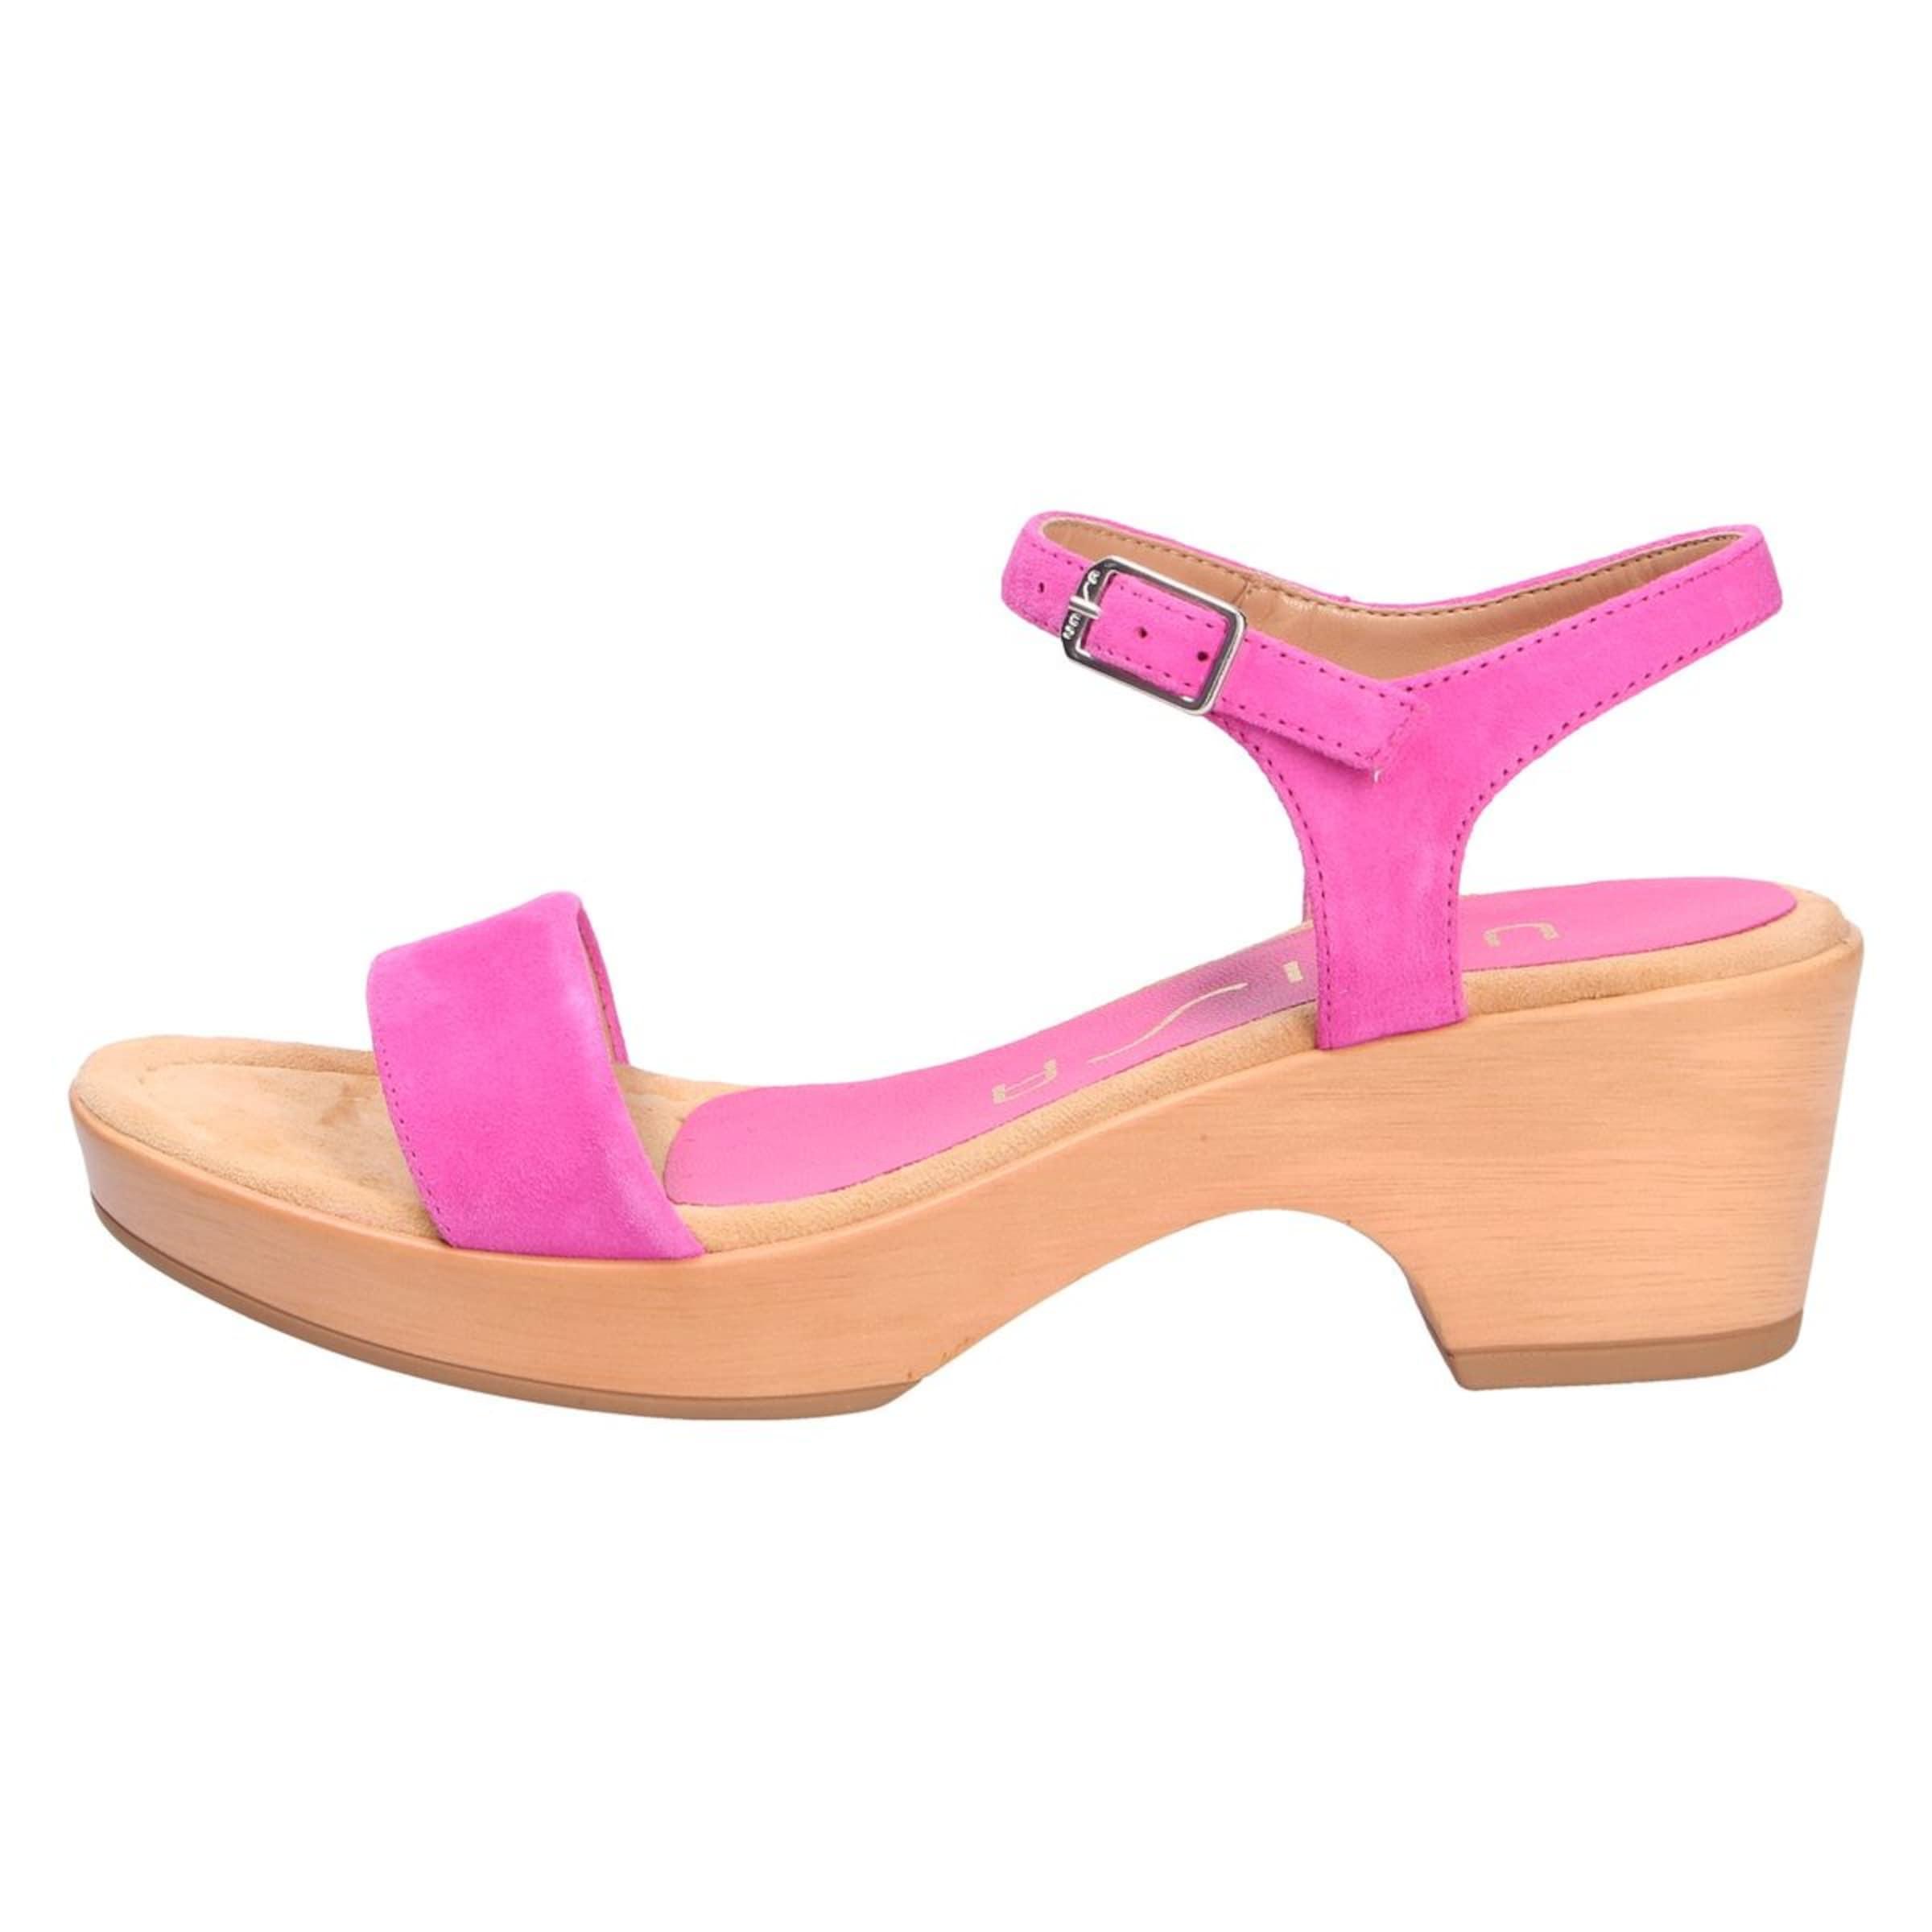 Unisa Fuchsia Fuchsia Unisa Sandale In Unisa Sandale In ScAq4jL35R